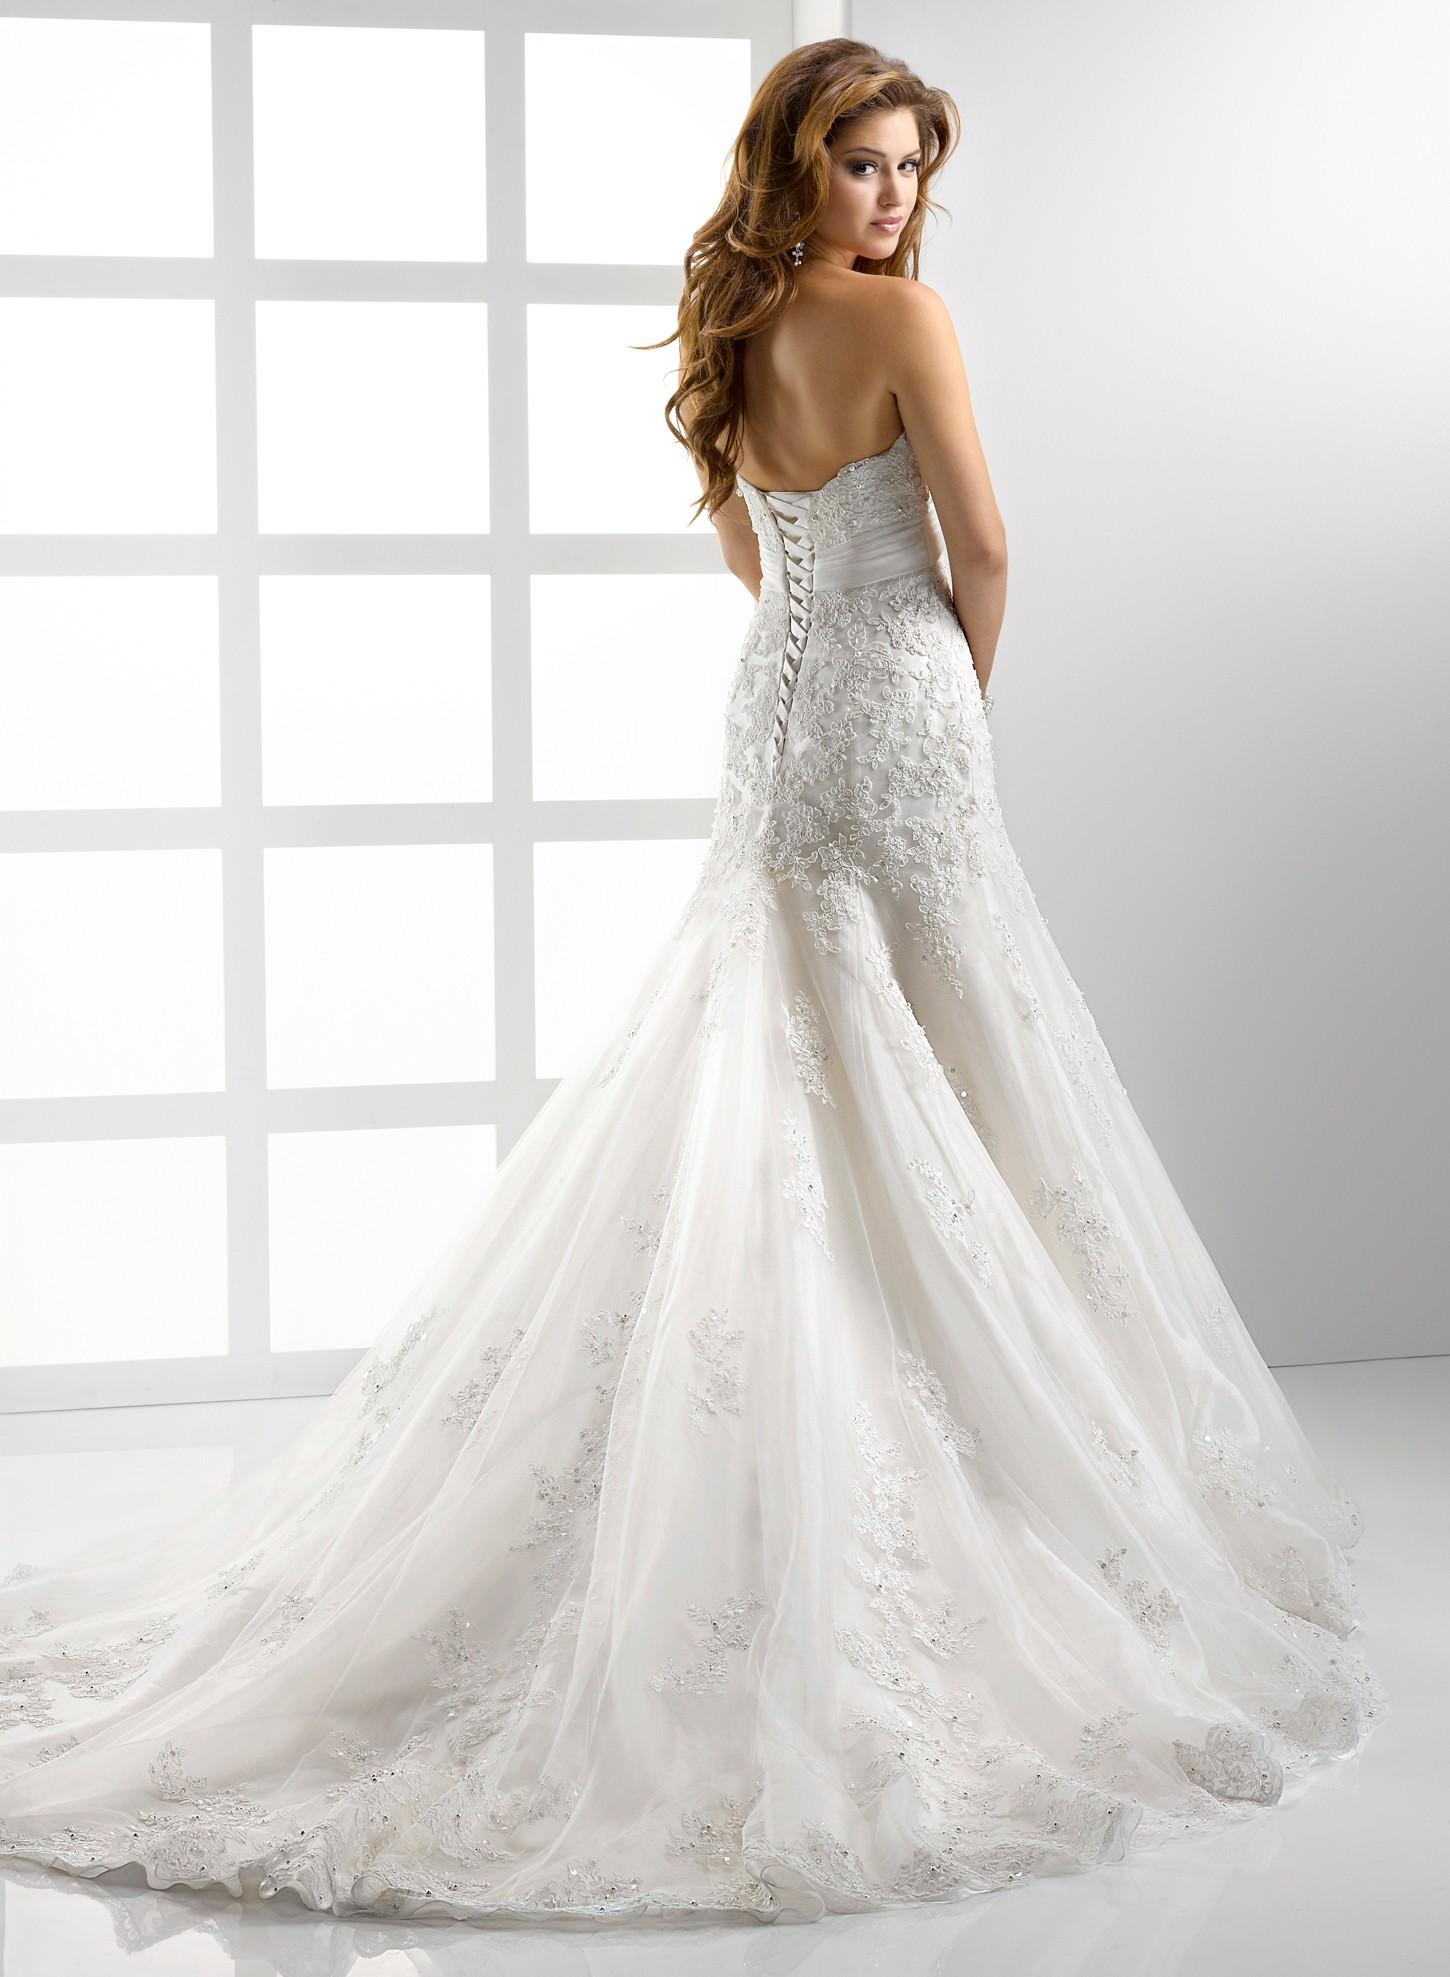 wedding dresses site:pinterest.com photo - 1